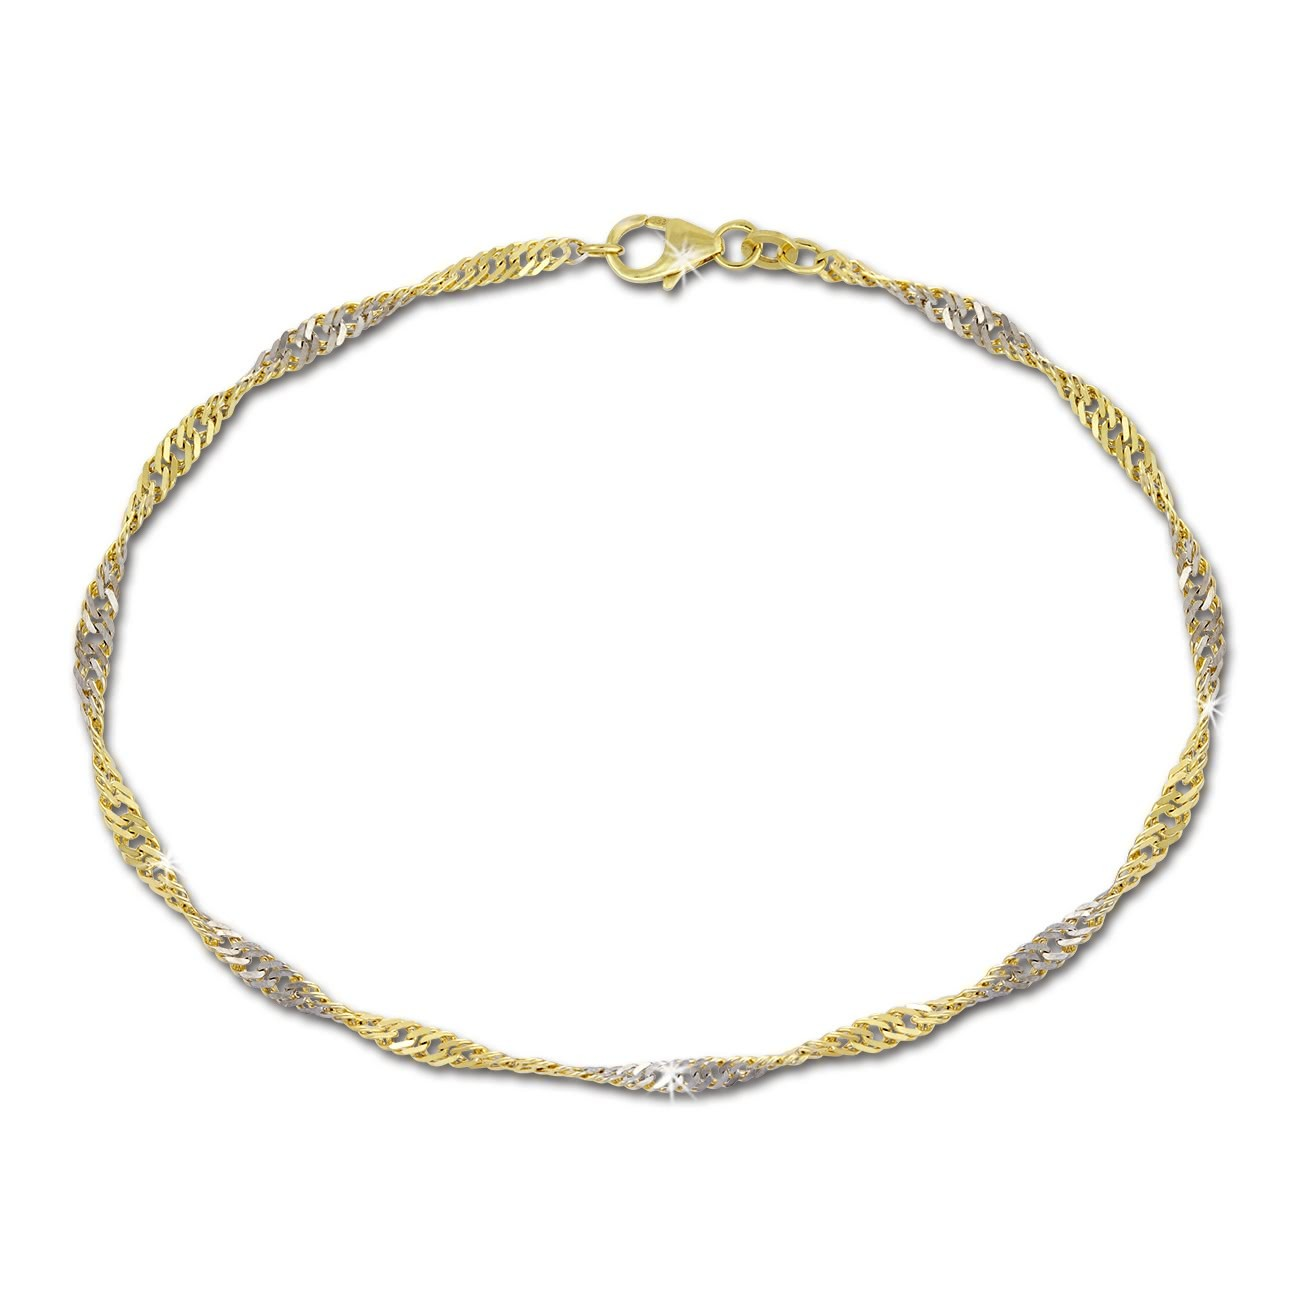 SilberDream Armband Singapur gedreht 333 Gold 19cm 8 Karat GDA0069Y